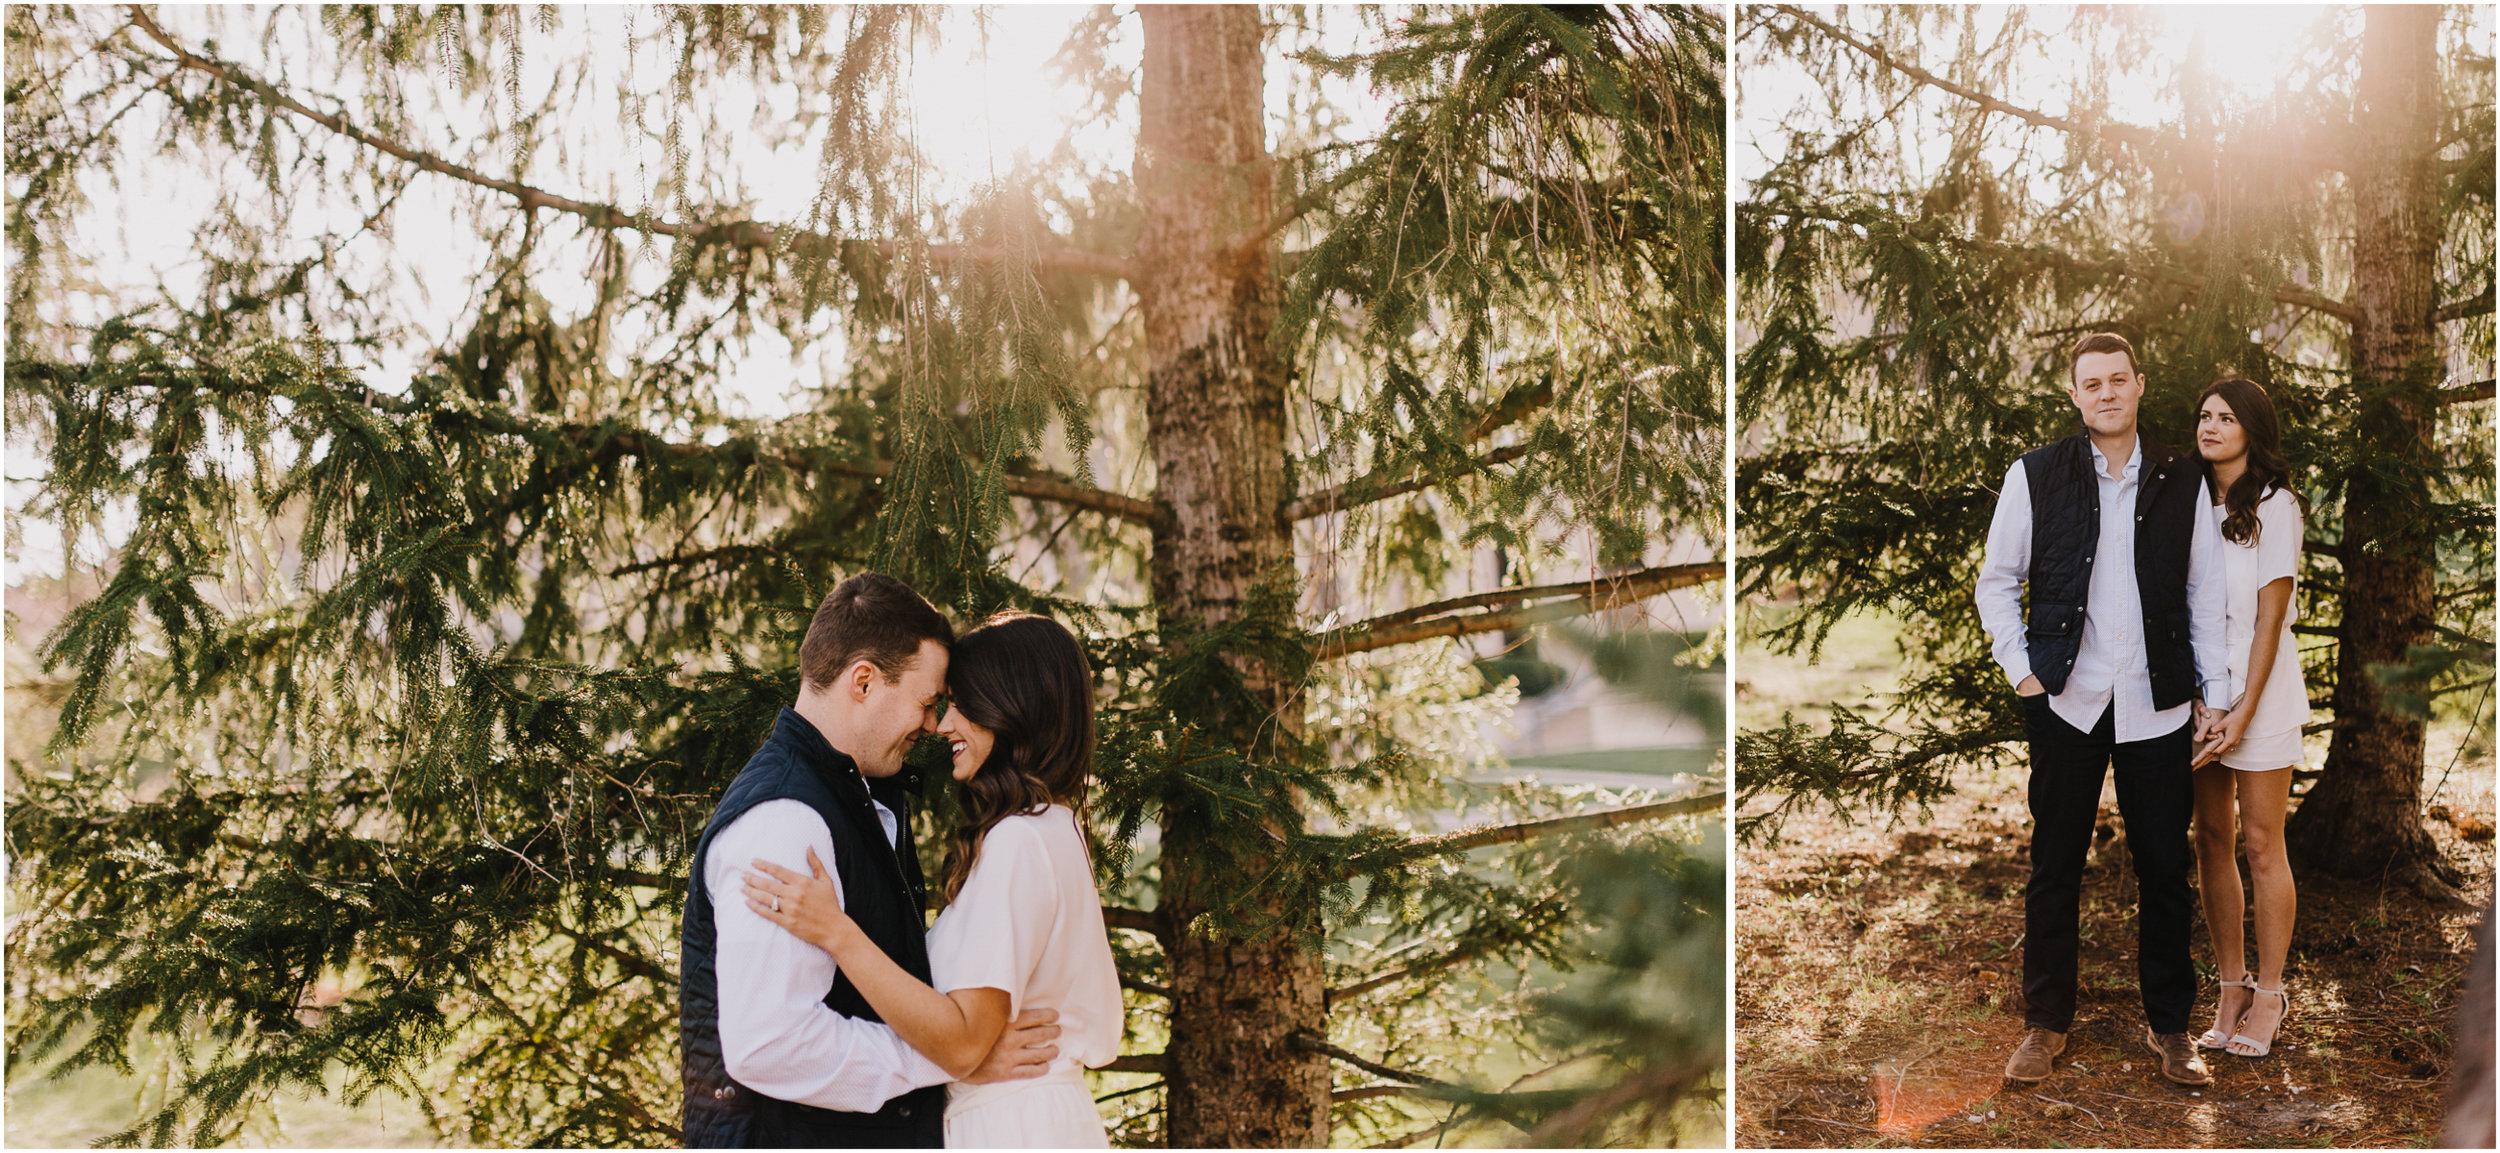 alyssa barletter photography unity village missouri spring engagement session photographer-2.jpg